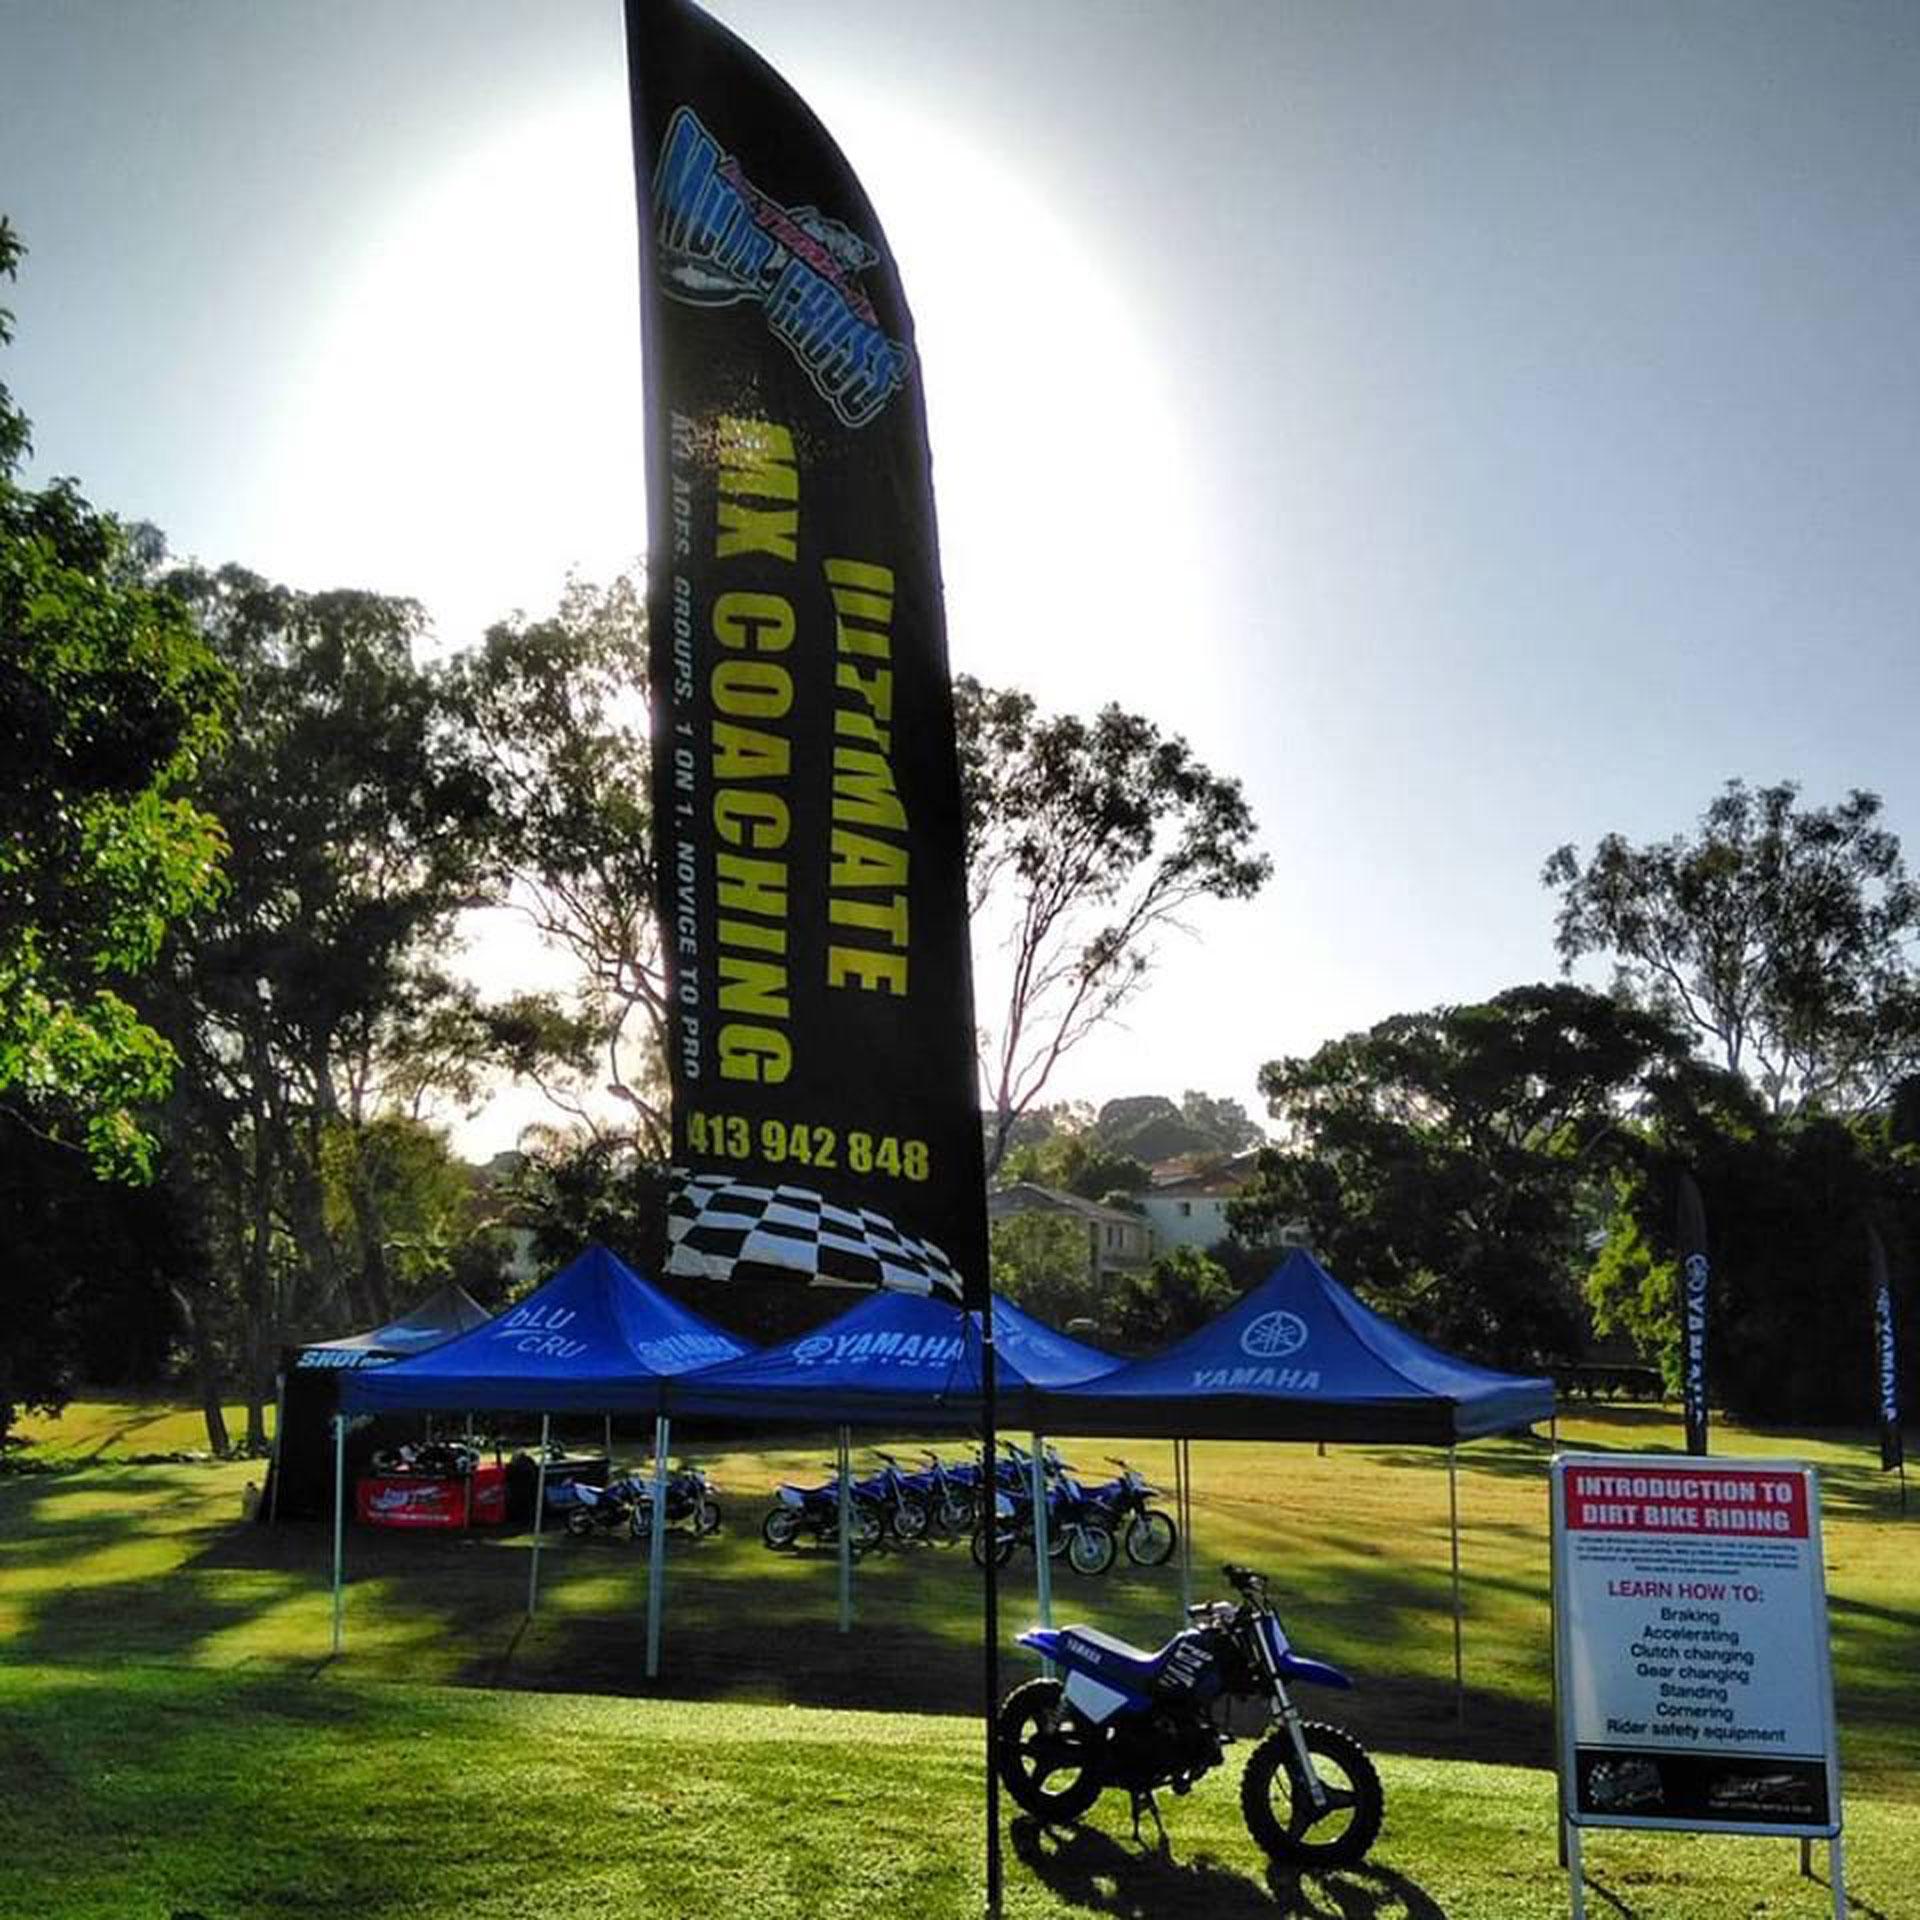 Ultimate Motocross coaching has won the Australian Small Business Award